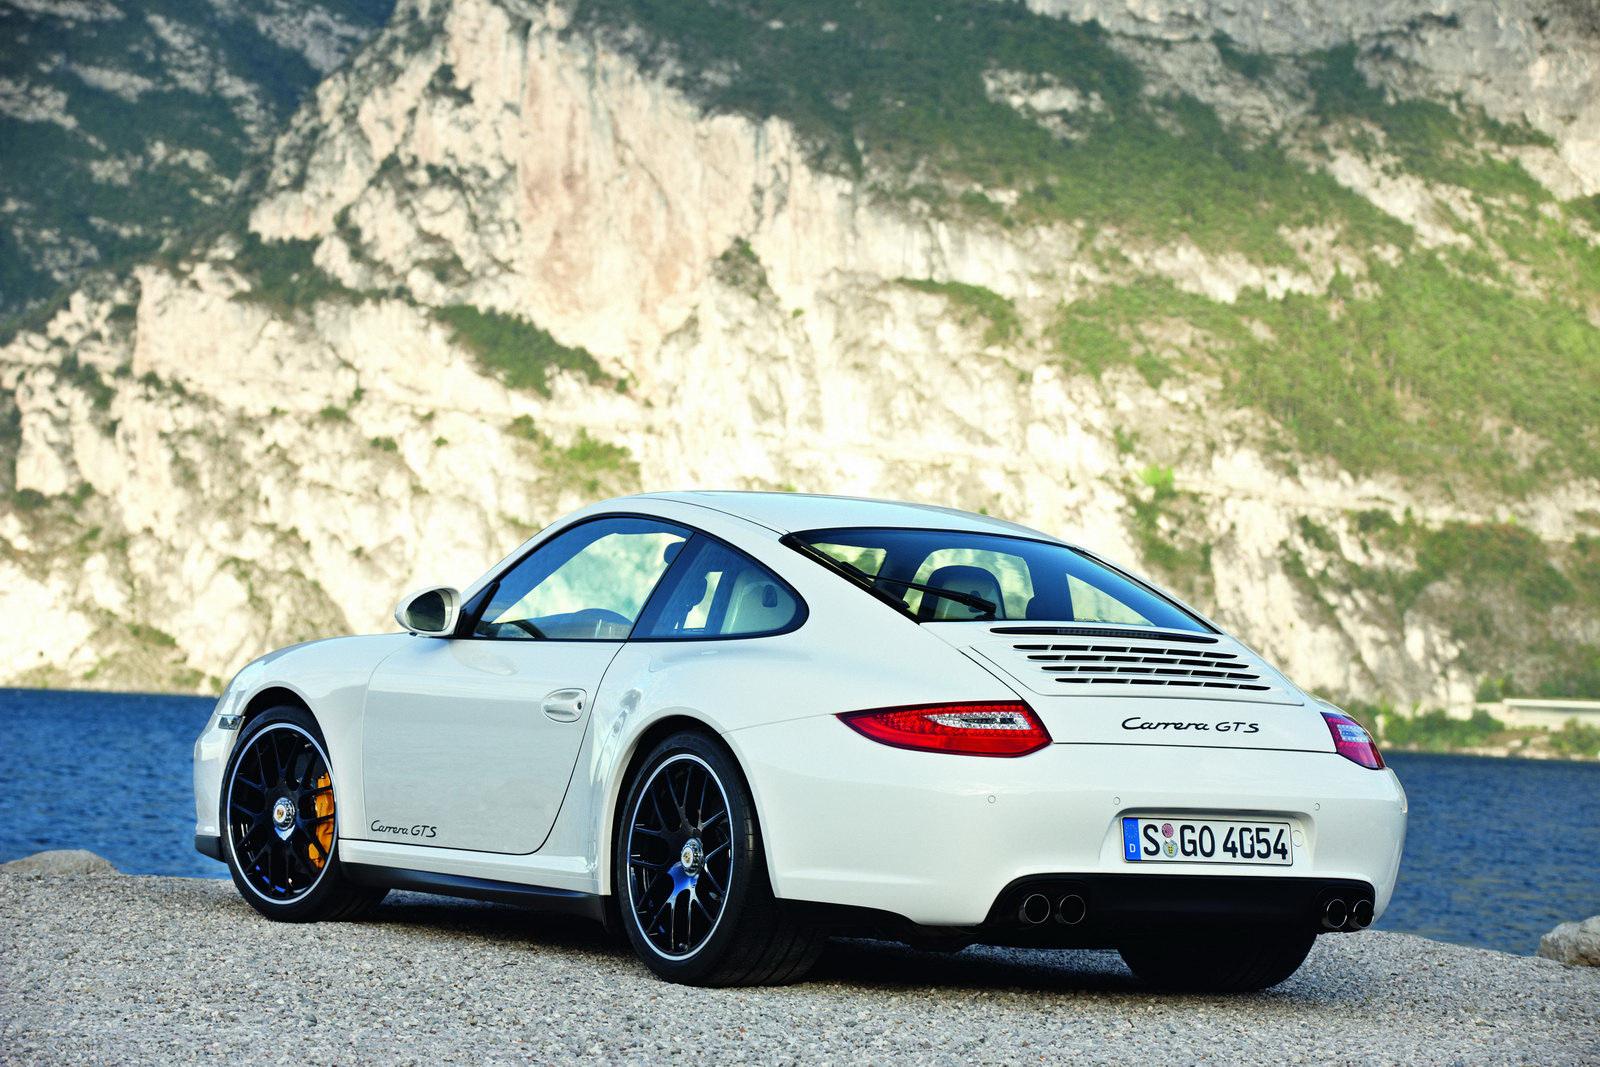 Porsche 911 Carrera GTS Archives - Unorthodox Clothing